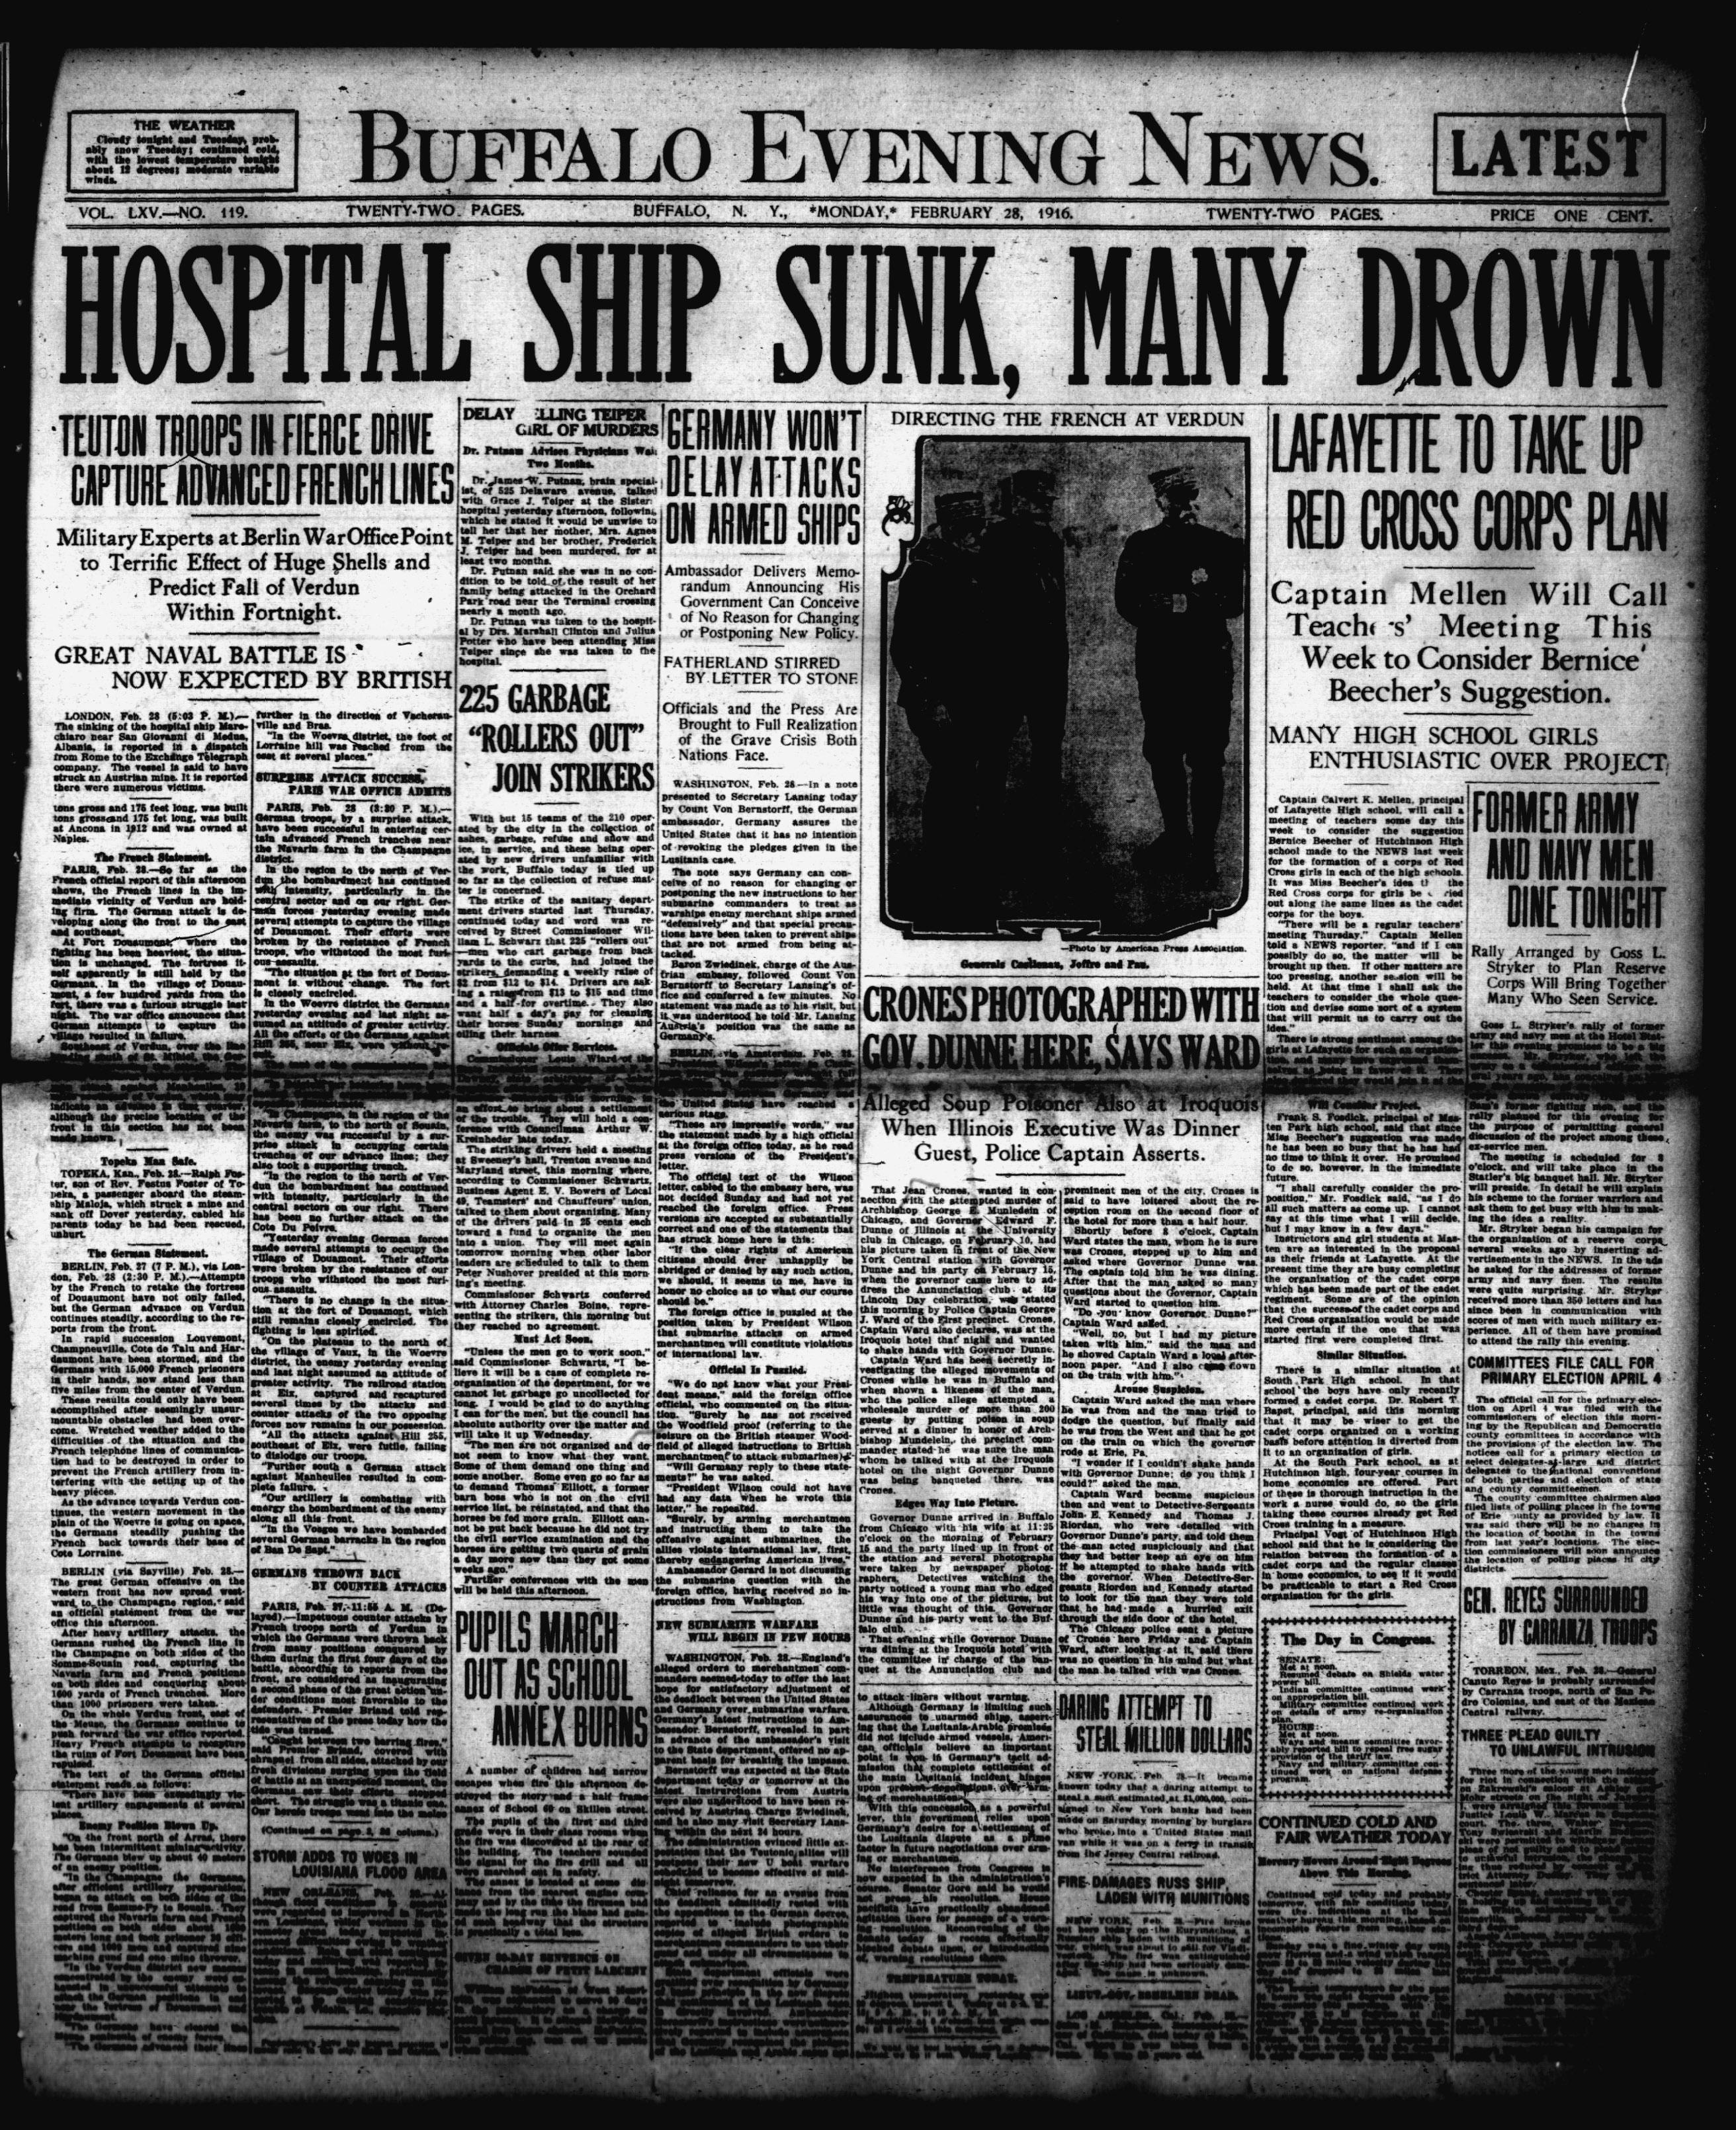 Feb 28 1916